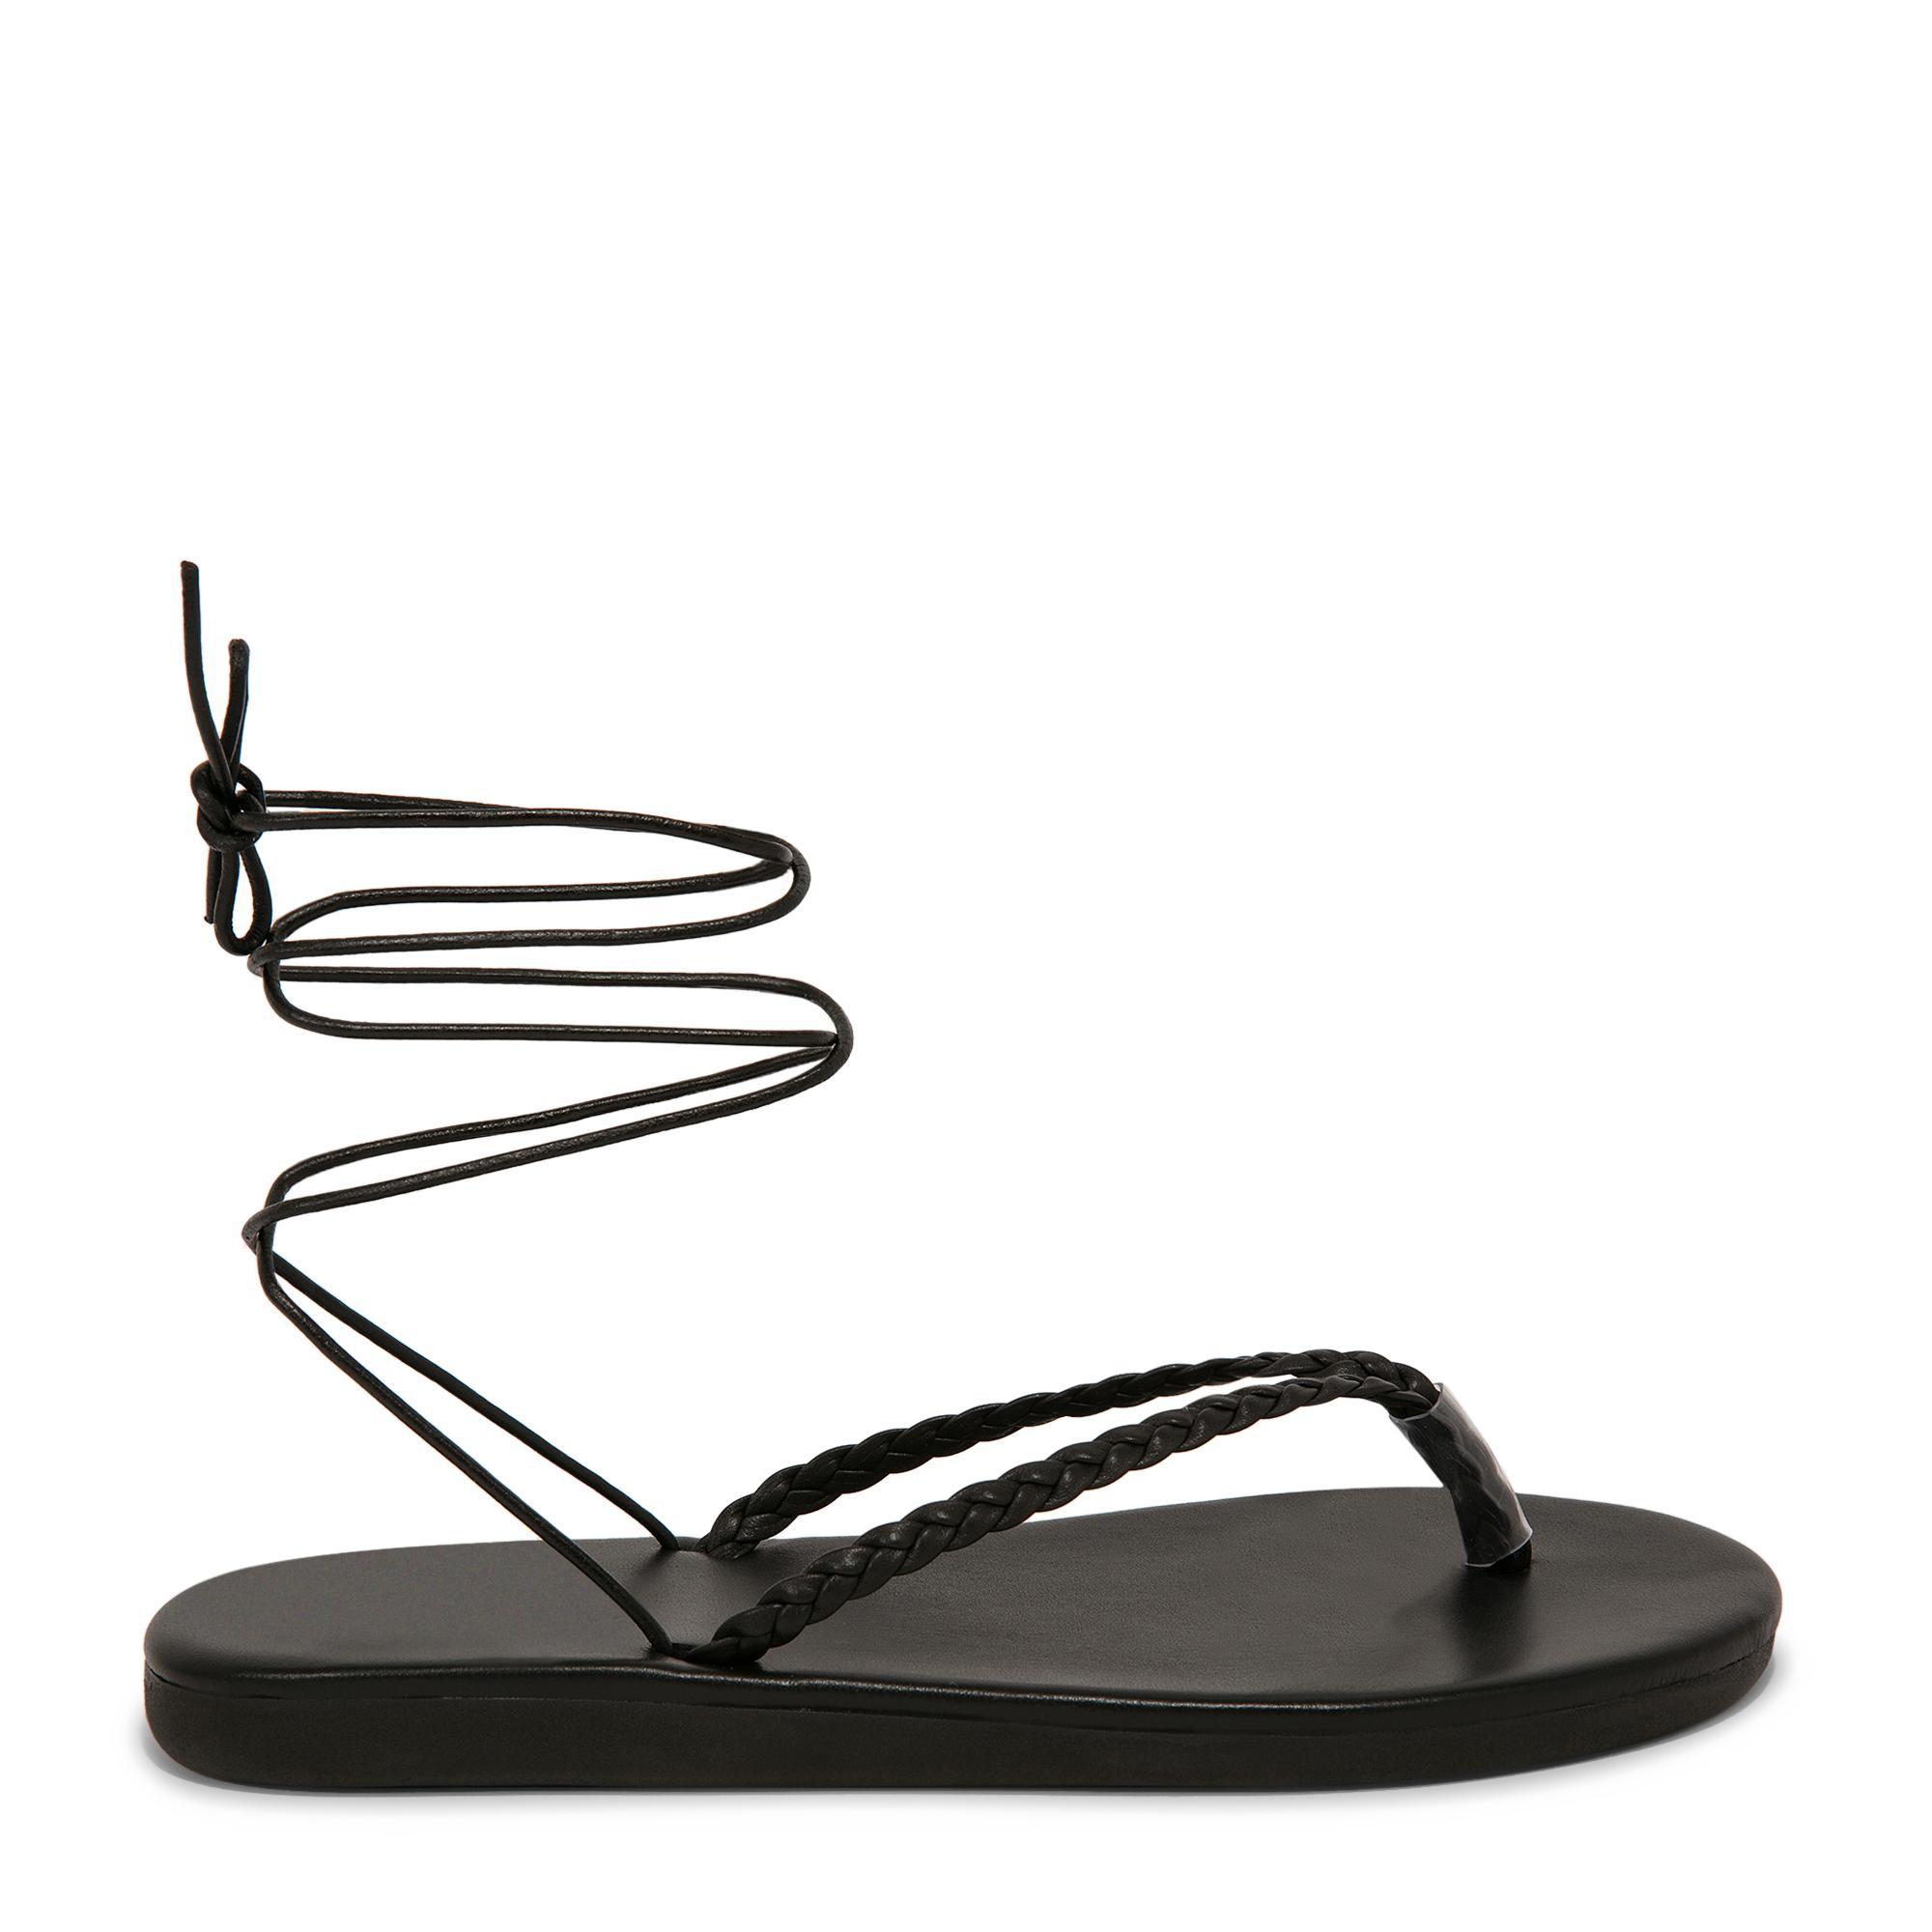 Plage sandals